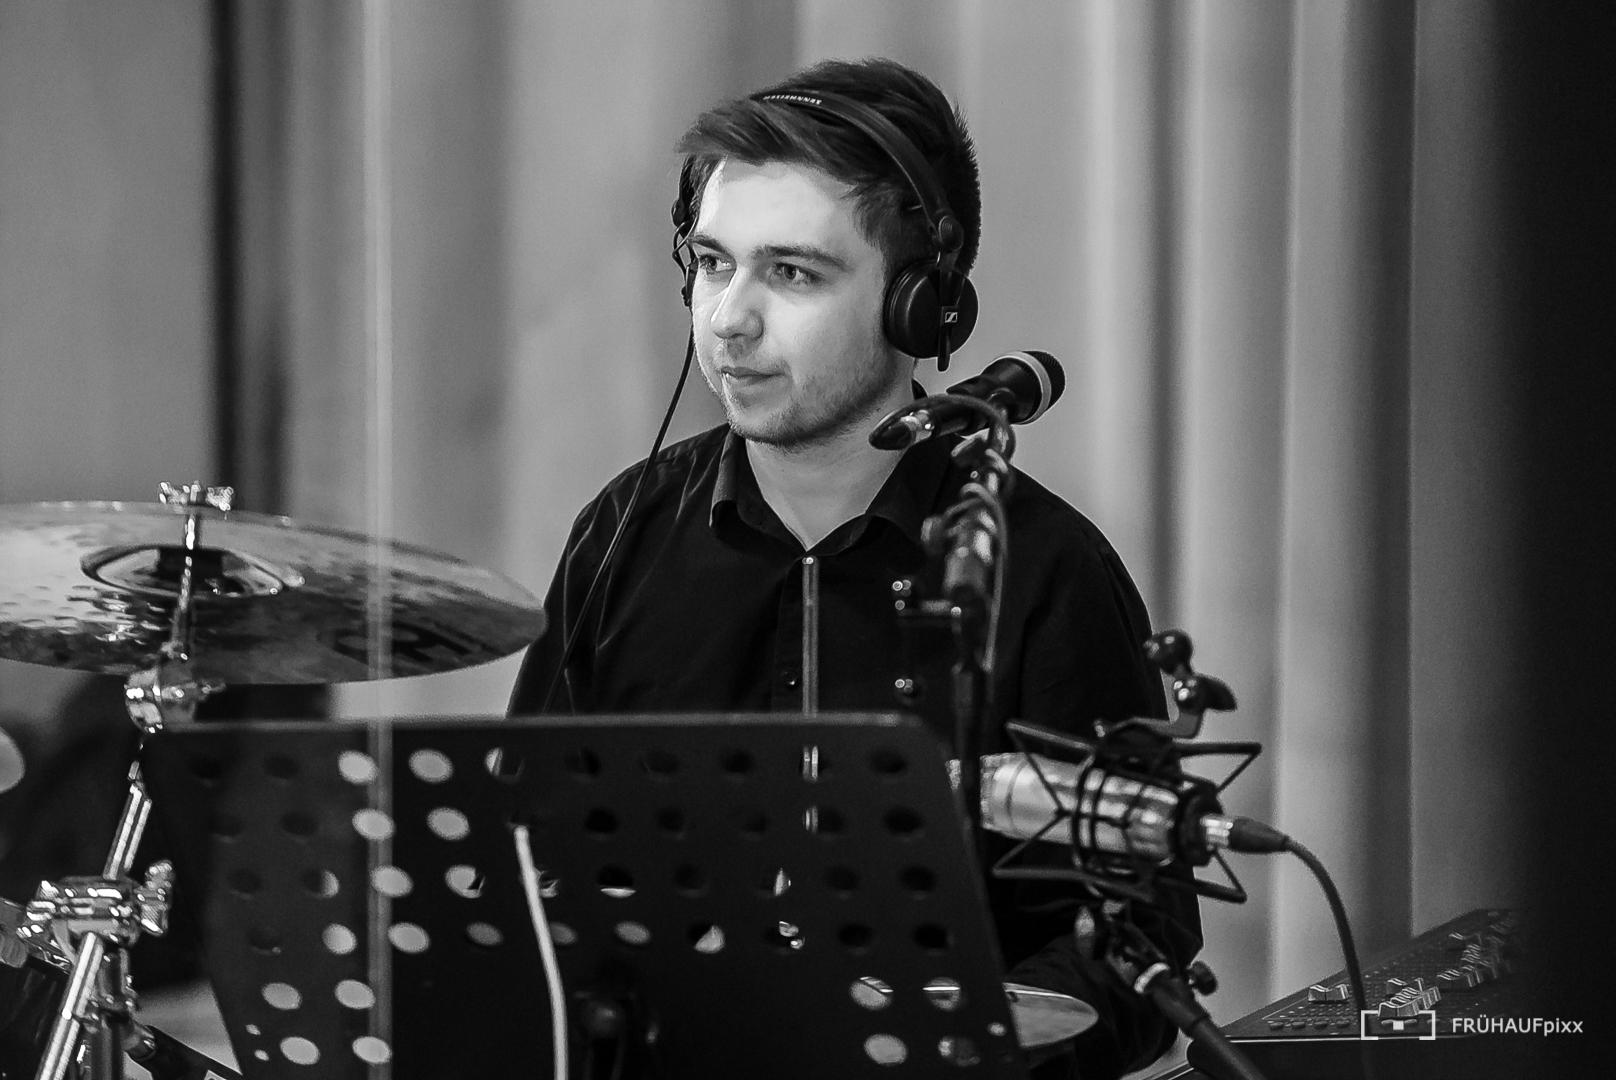 Dominik Vogl : Drums, Vocals